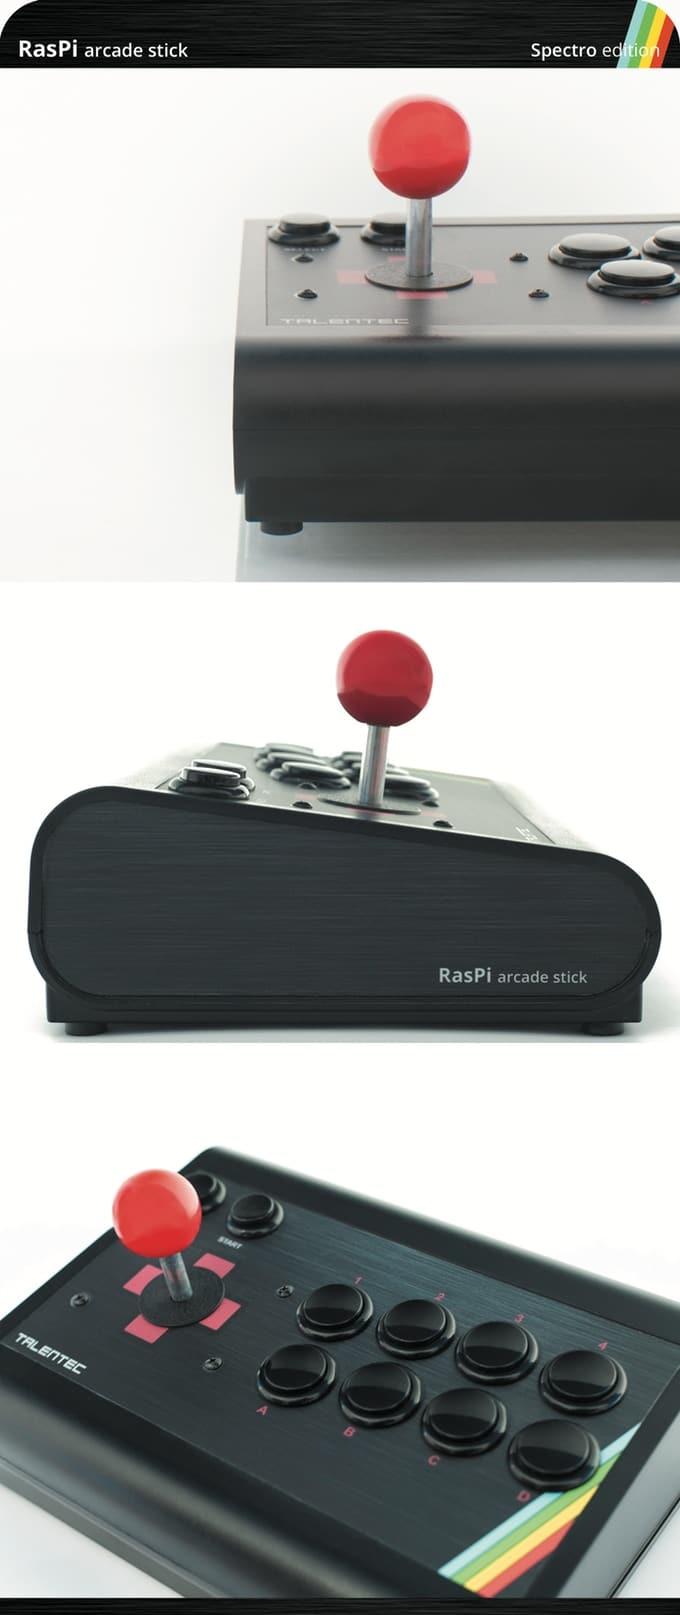 190502 TALENTEC RasPi arcade stick Spectro edition - RasPi Arcade Stick 64gb Pro - Spectro Edition - smart-arcade-stick-fr